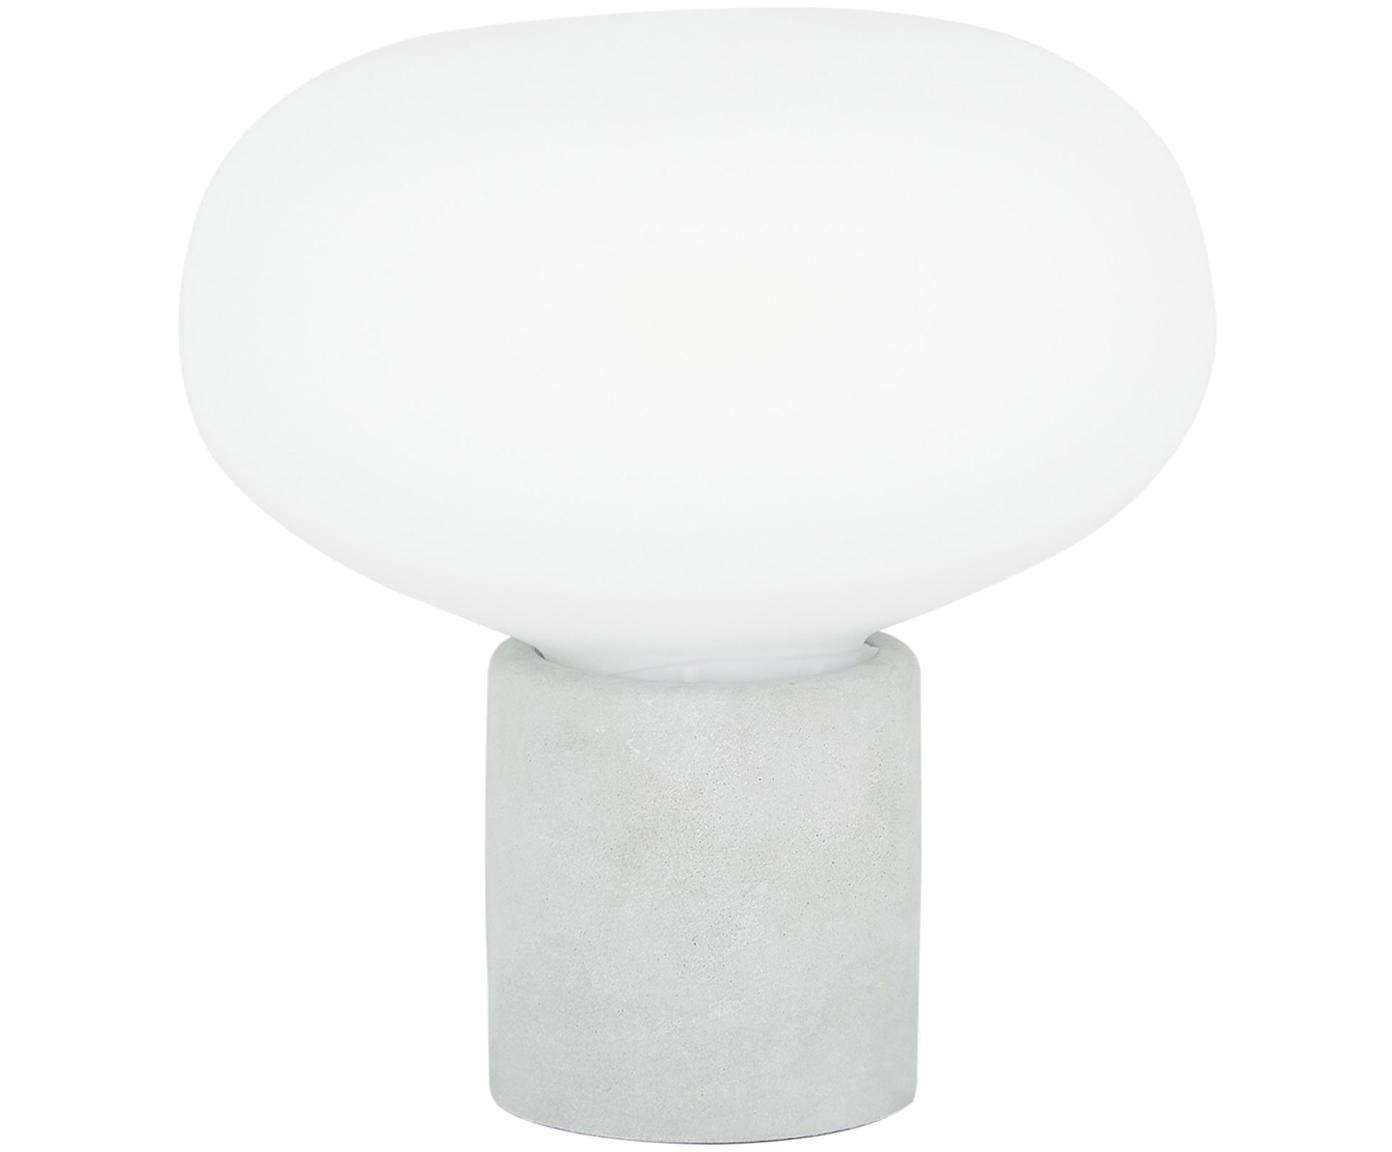 Beton-Tischleuchte Alma, Lampenfuß: Beton, Lampenschirm: Glas, Lampenfuß: Grauer BetonLampenschirm: Weiß, Ø 23 x H 24 cm